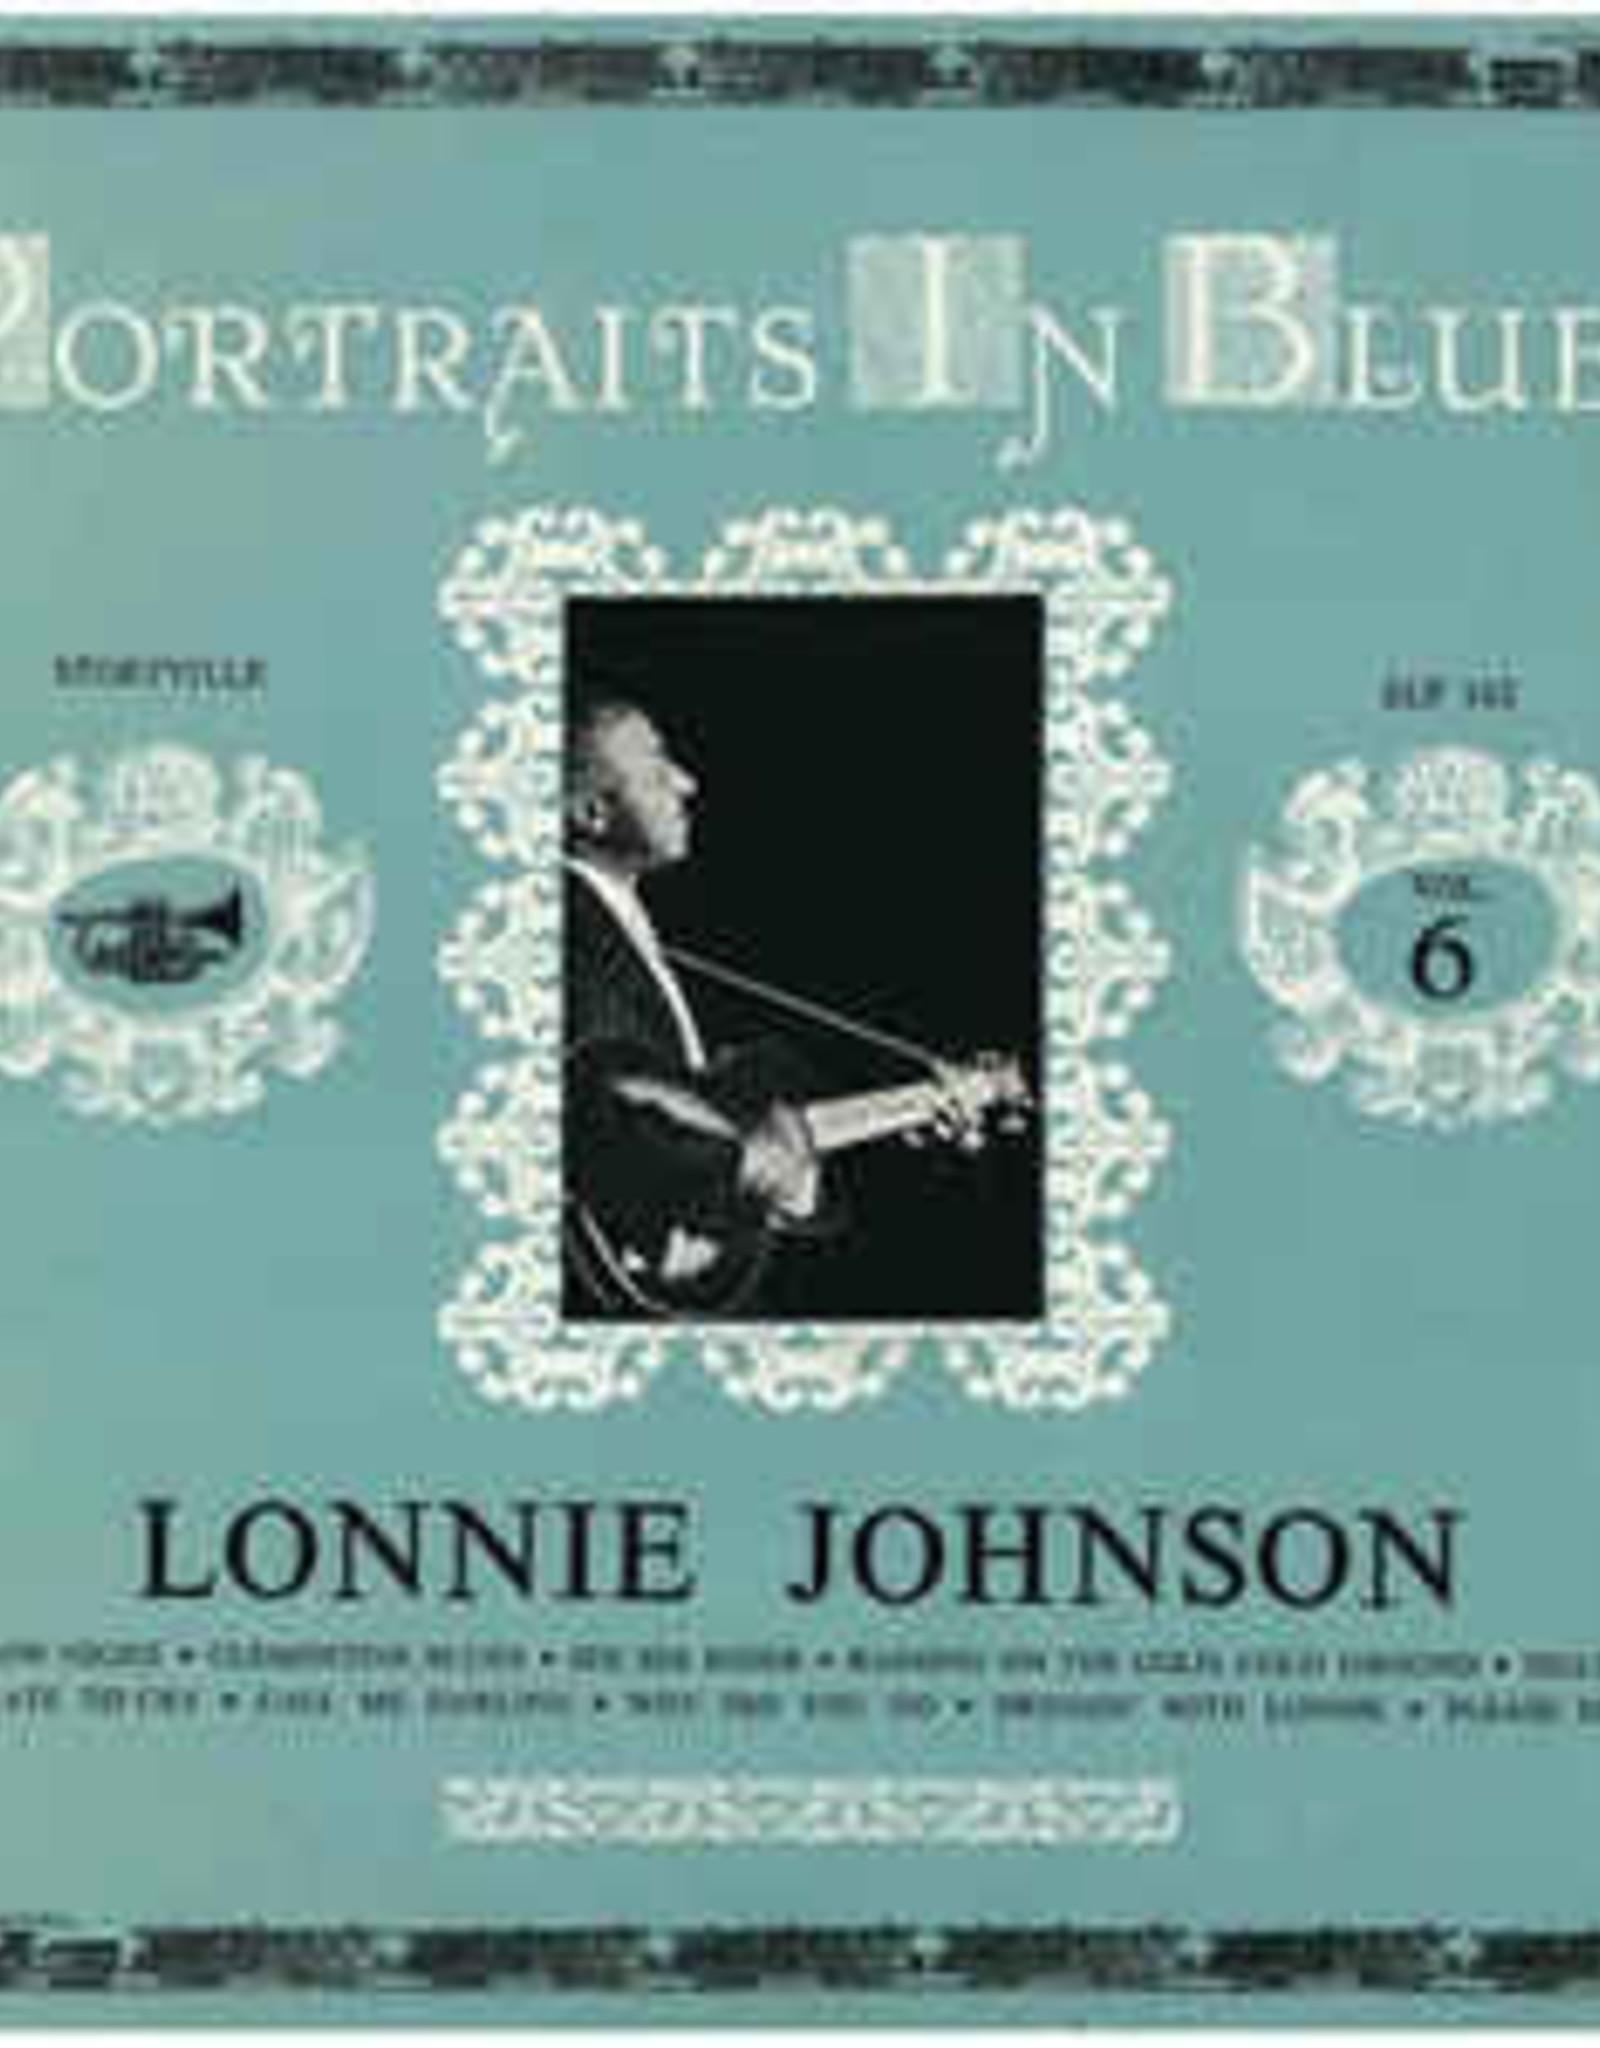 Lonnie Johnson - Portraits In Blues Vol. 6